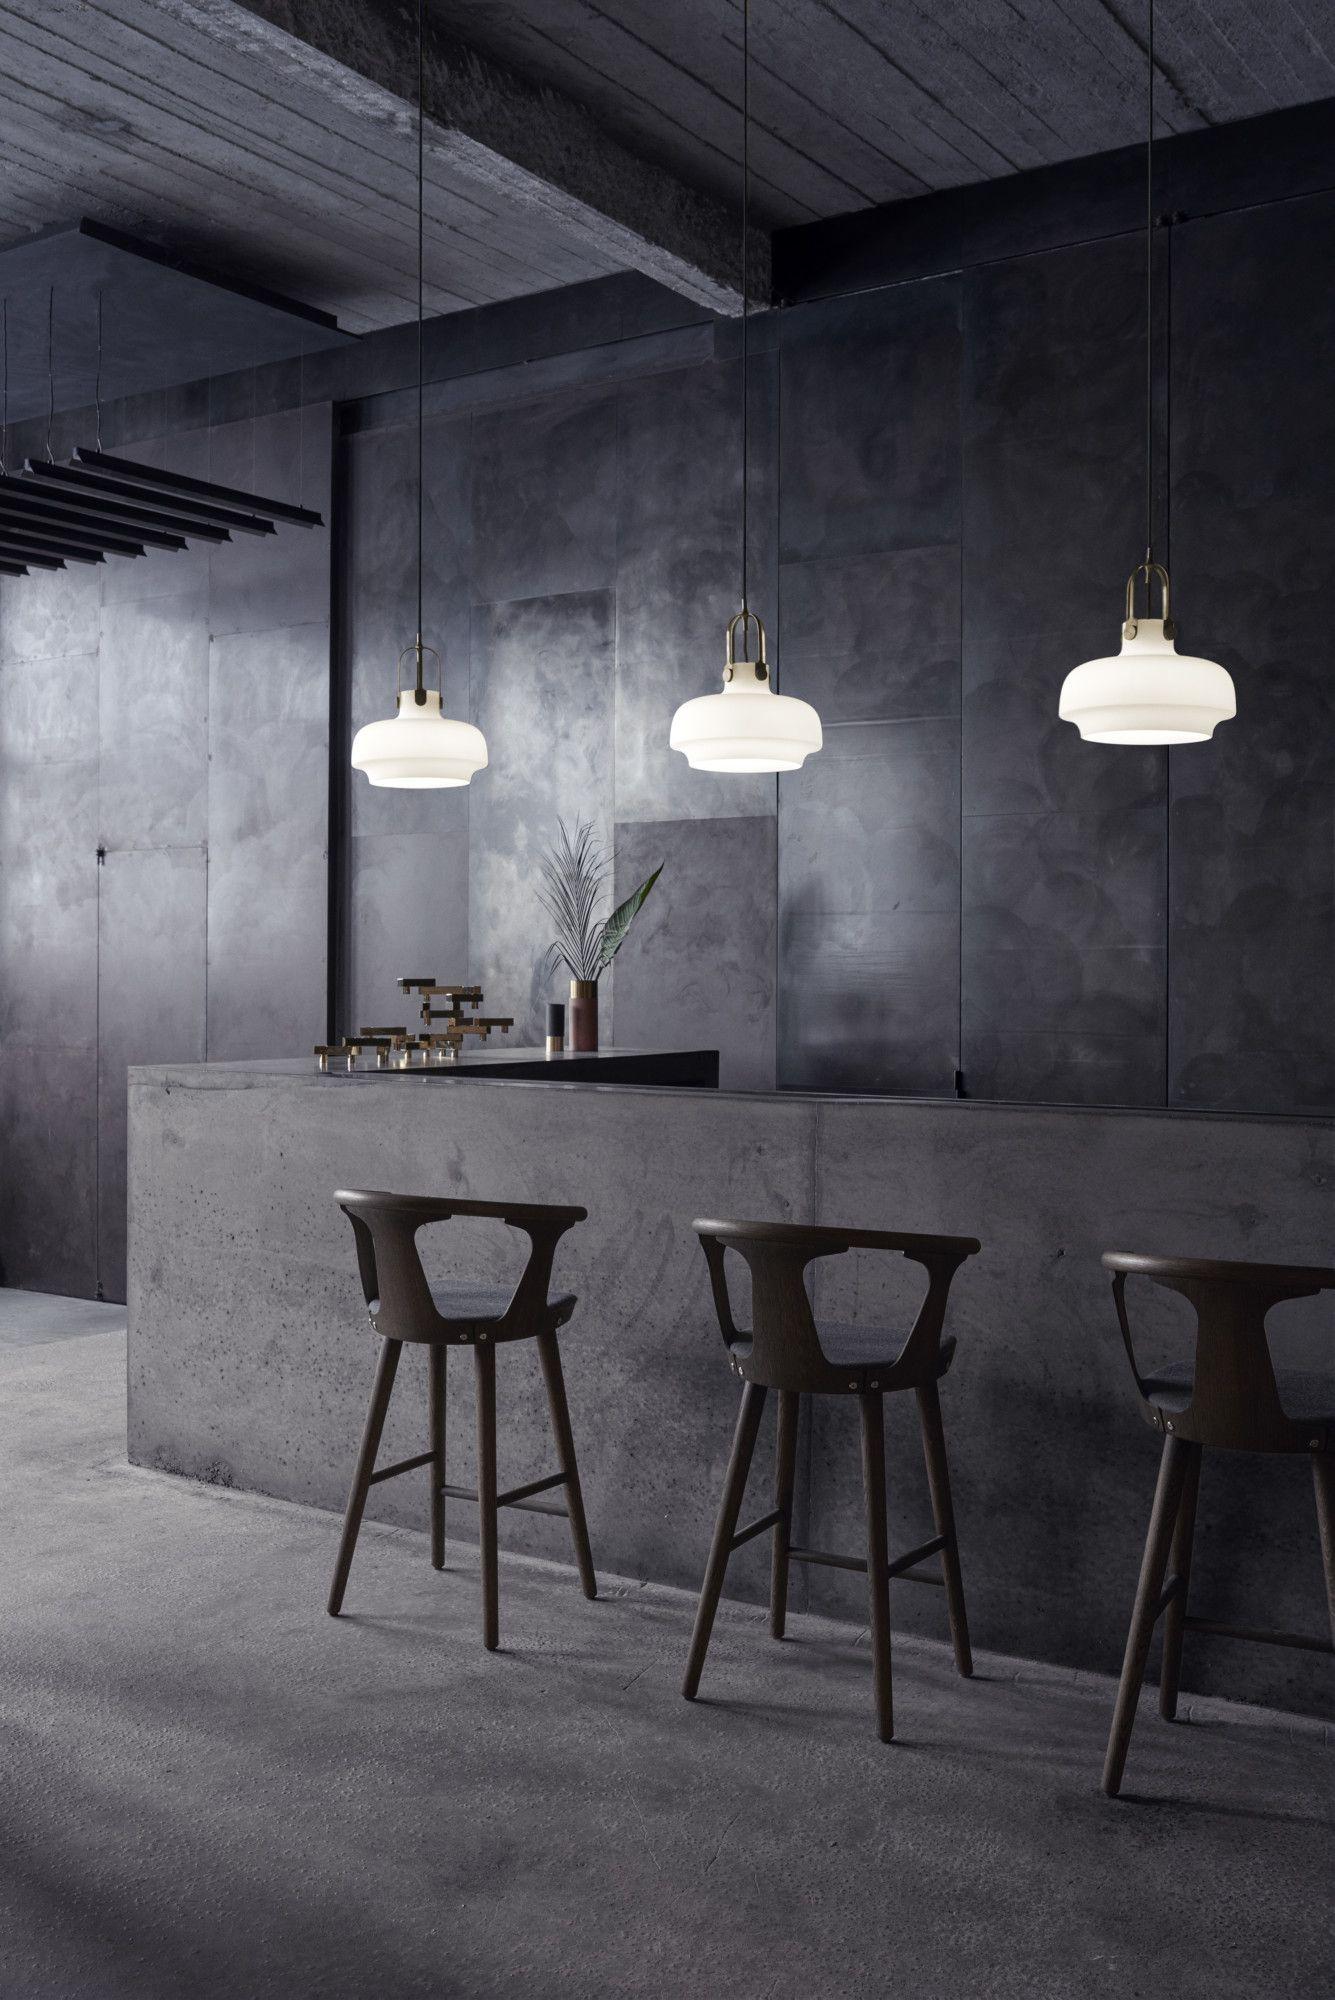 Copenhagen By Tradition In 2020 Wall Lamp Traditional Space Copenhagen